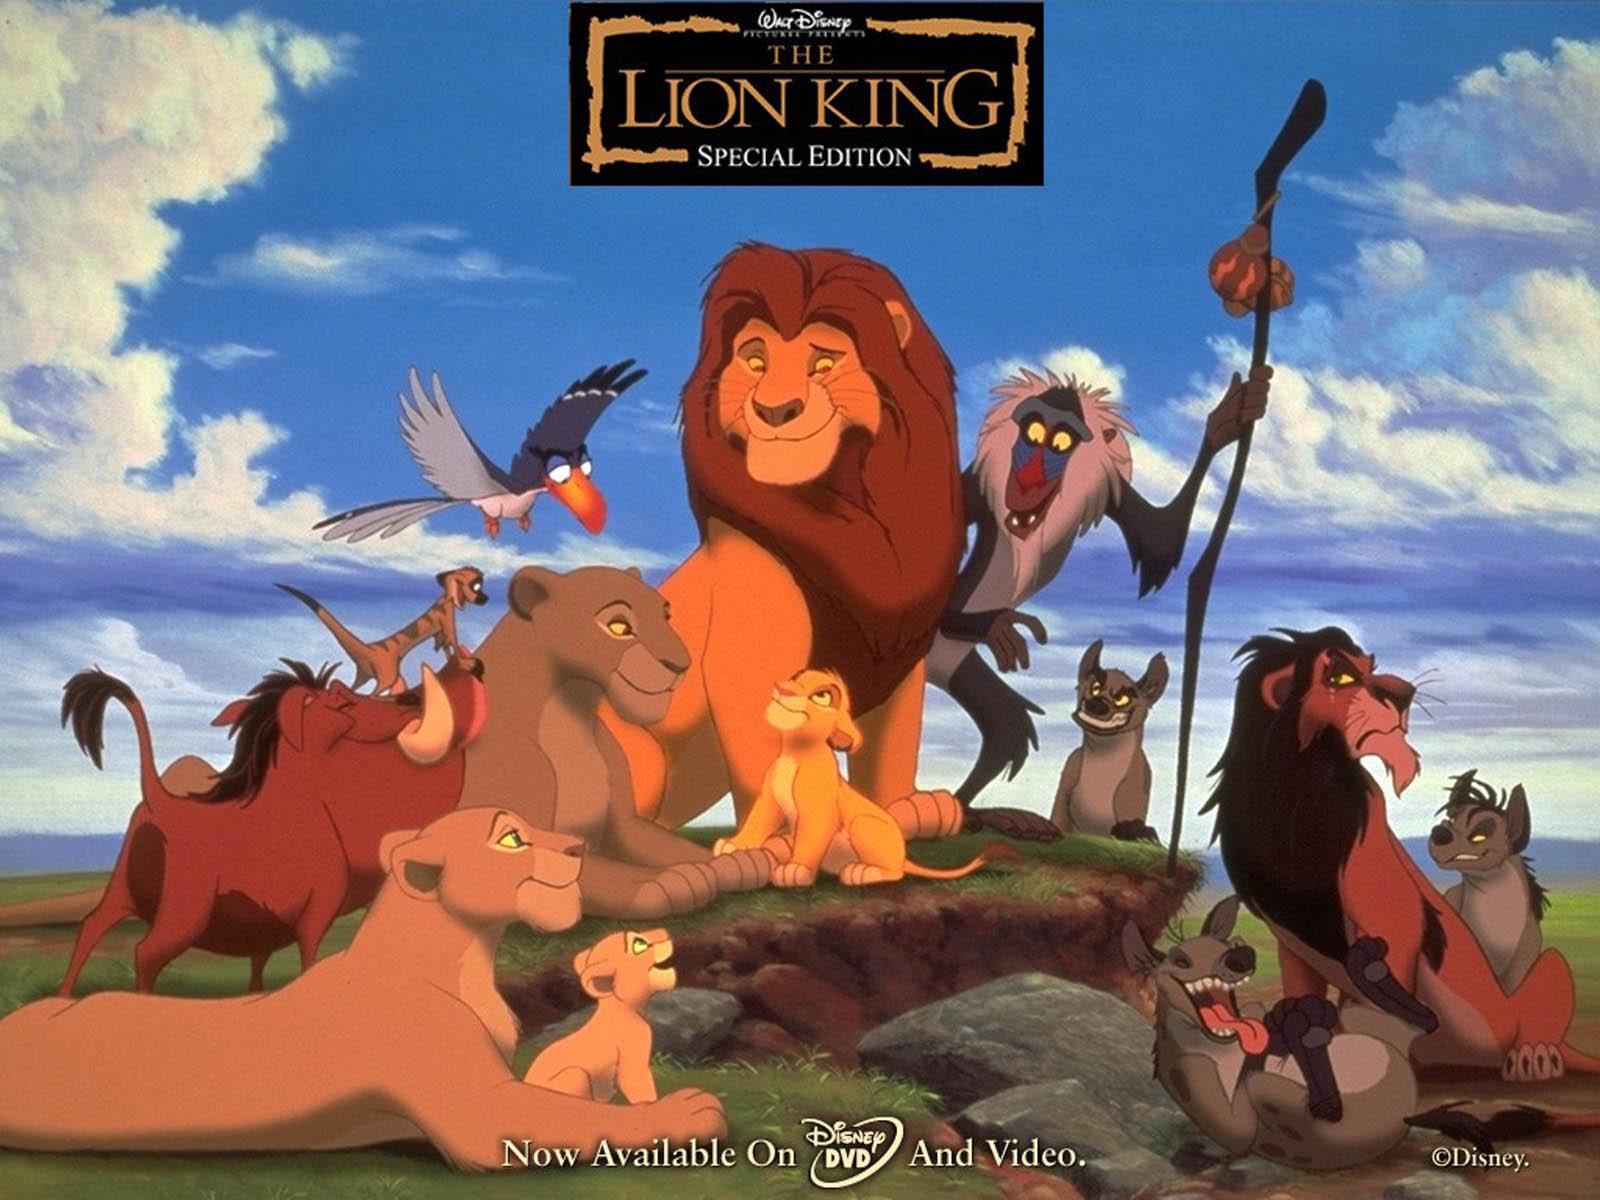 Disney Movies Lion King 1600x1200 Download Hd Wallpaper Wallpapertip